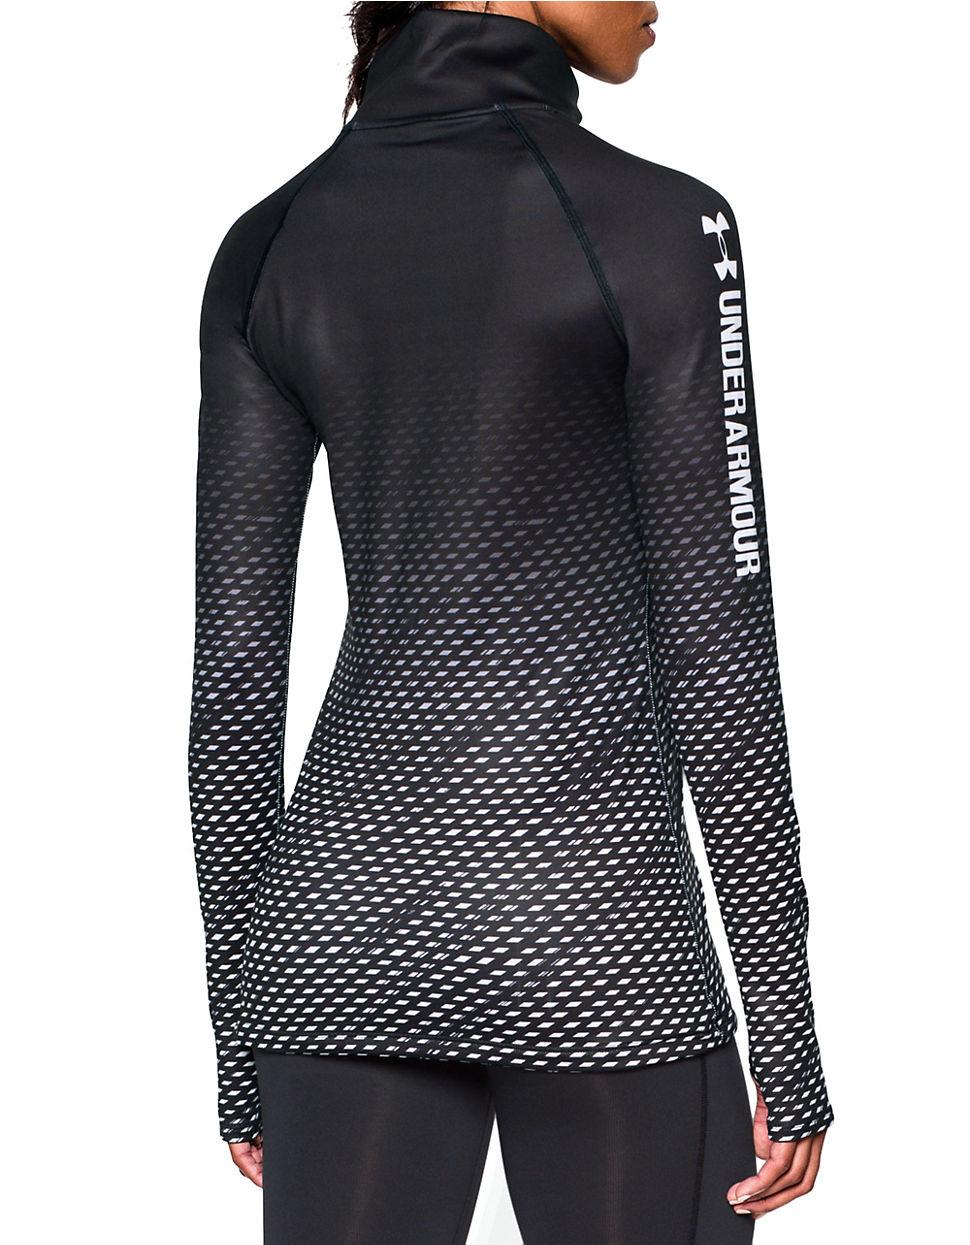 Under armour moisture wicking half zip shirt in black lyst for Moisture wicking dress shirts